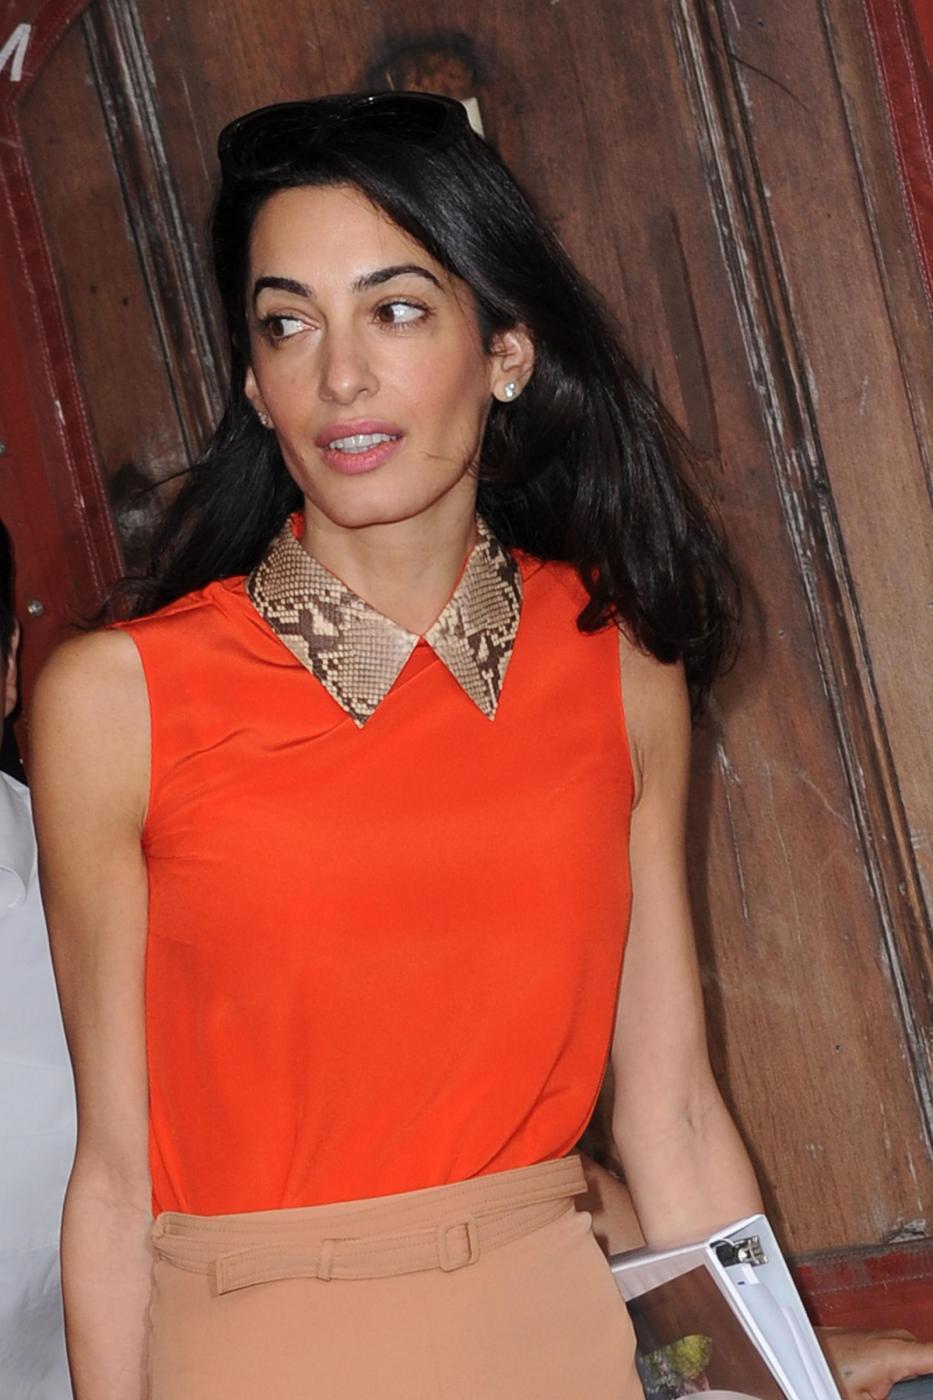 Amal Alamuddin magrissima, lady Clooney quasi scheletrica FOTO 10